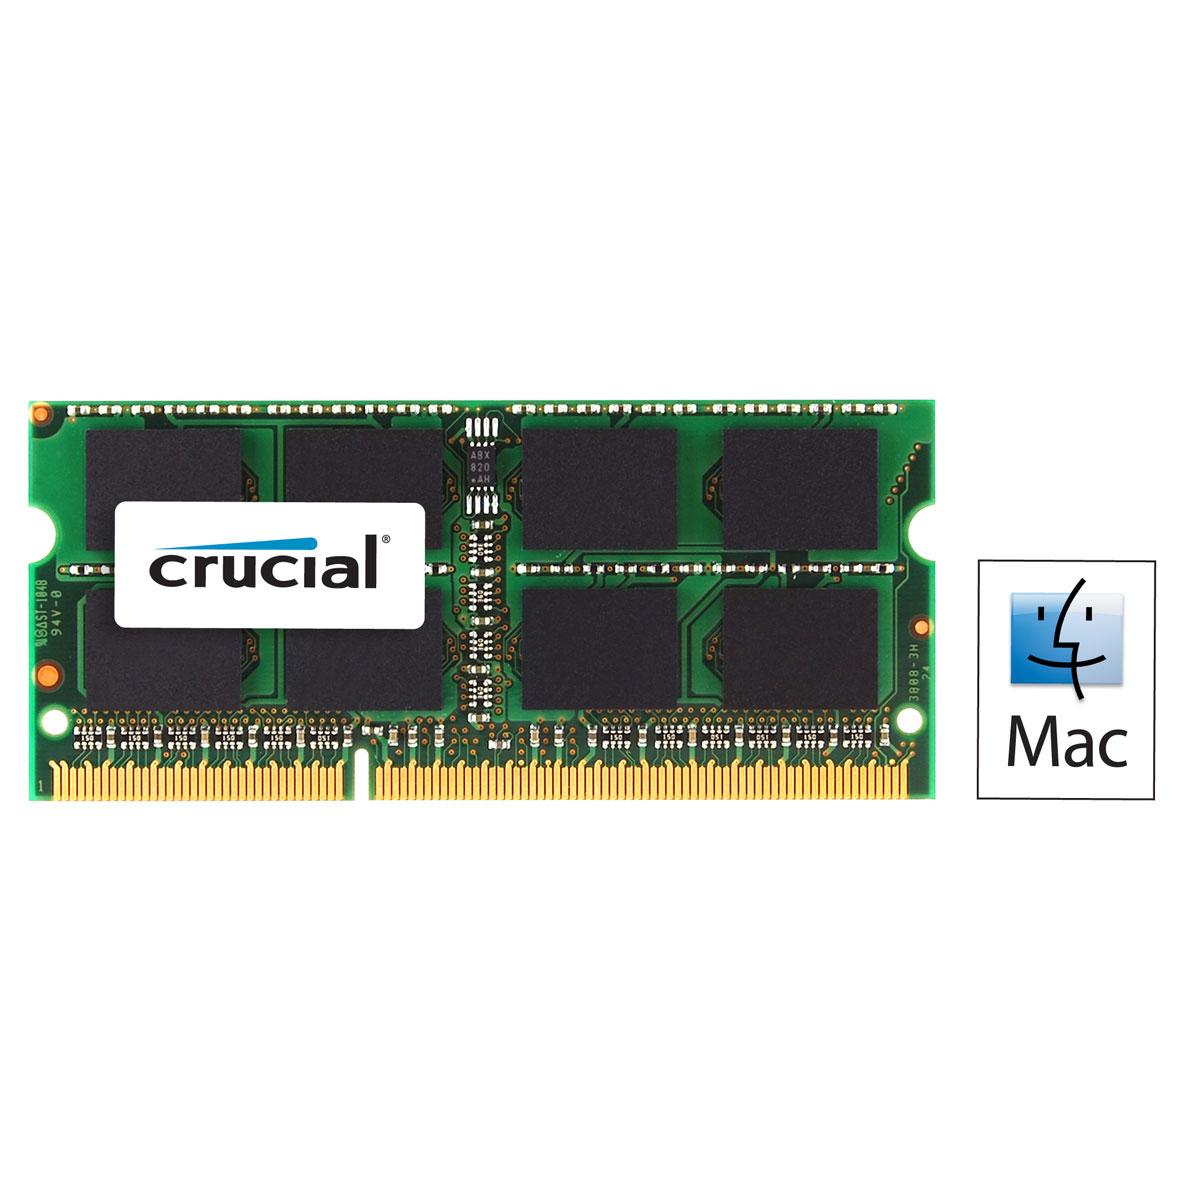 Mémoire PC Crucial for Mac SO-DIMM 2 Go DDR3 1066 MHz CL7 RAM SO-DIMM DDR3 PC8500 - CT2G3S1067MCEU (garantie à vie par Crucial)